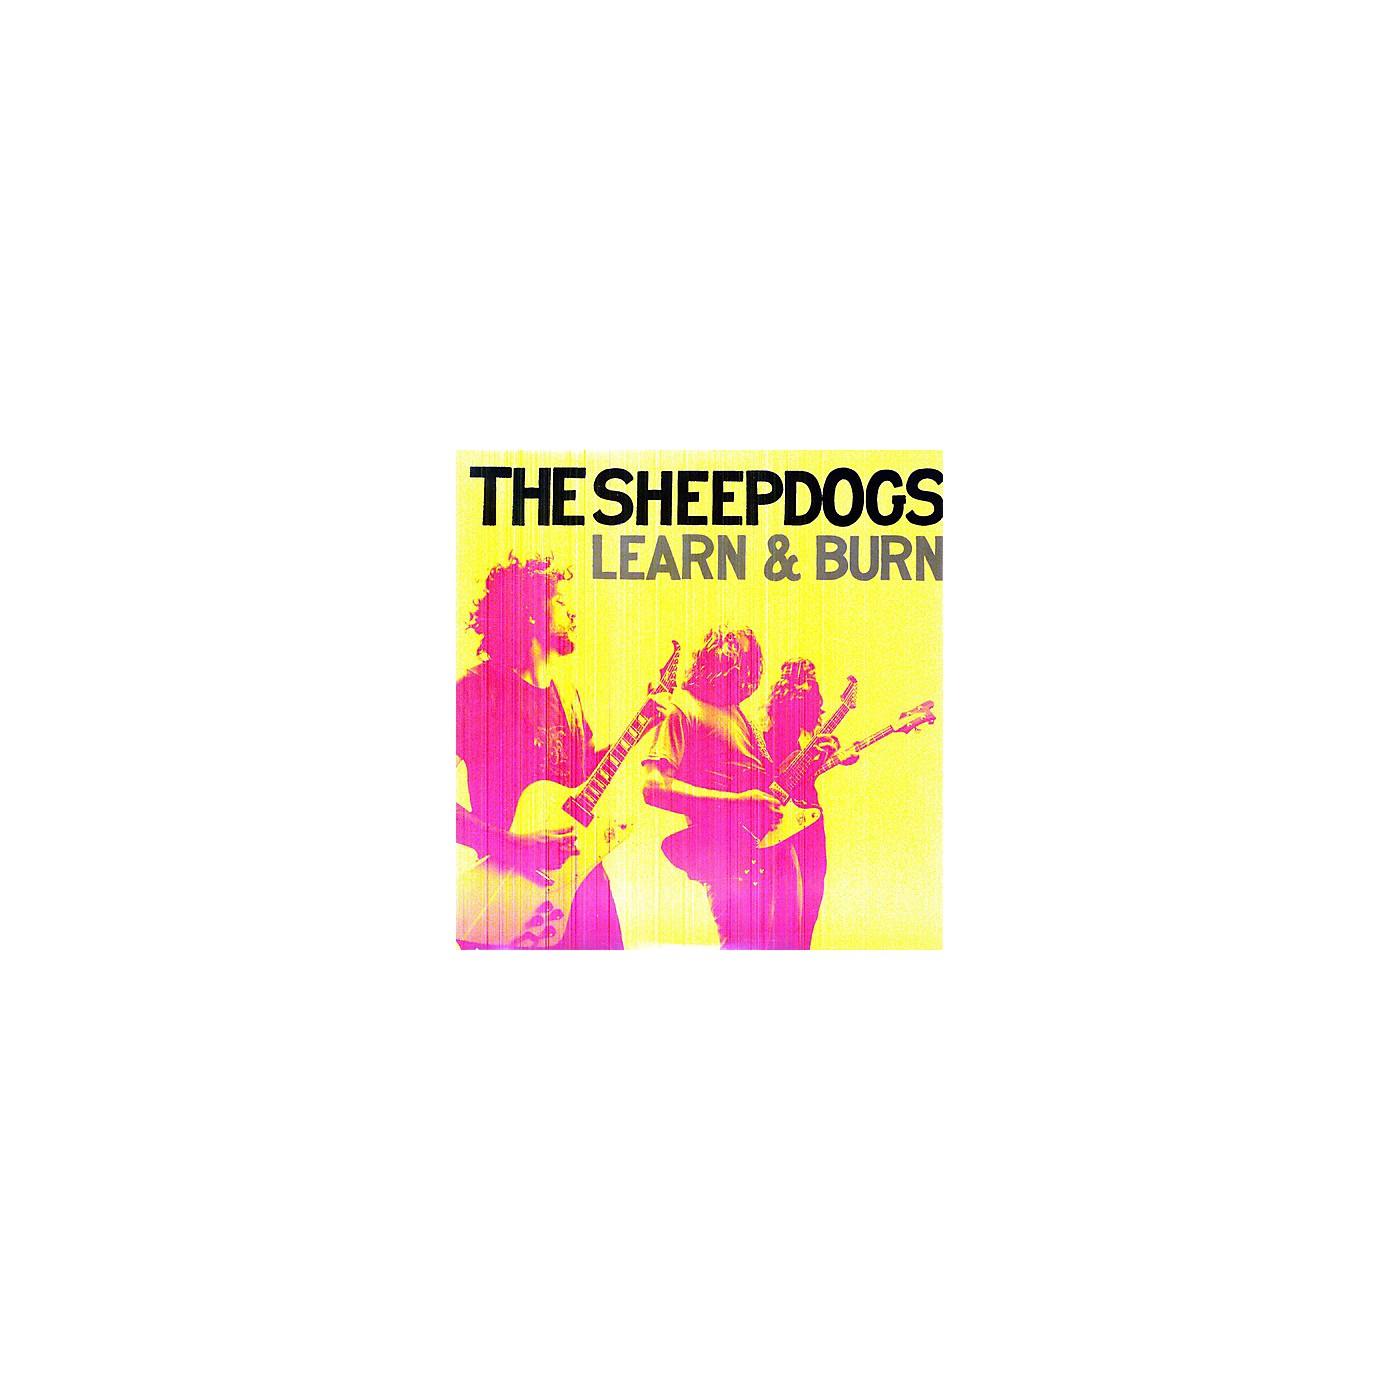 Alliance The Sheepdogs - Learn & Burn (Vinyl) thumbnail